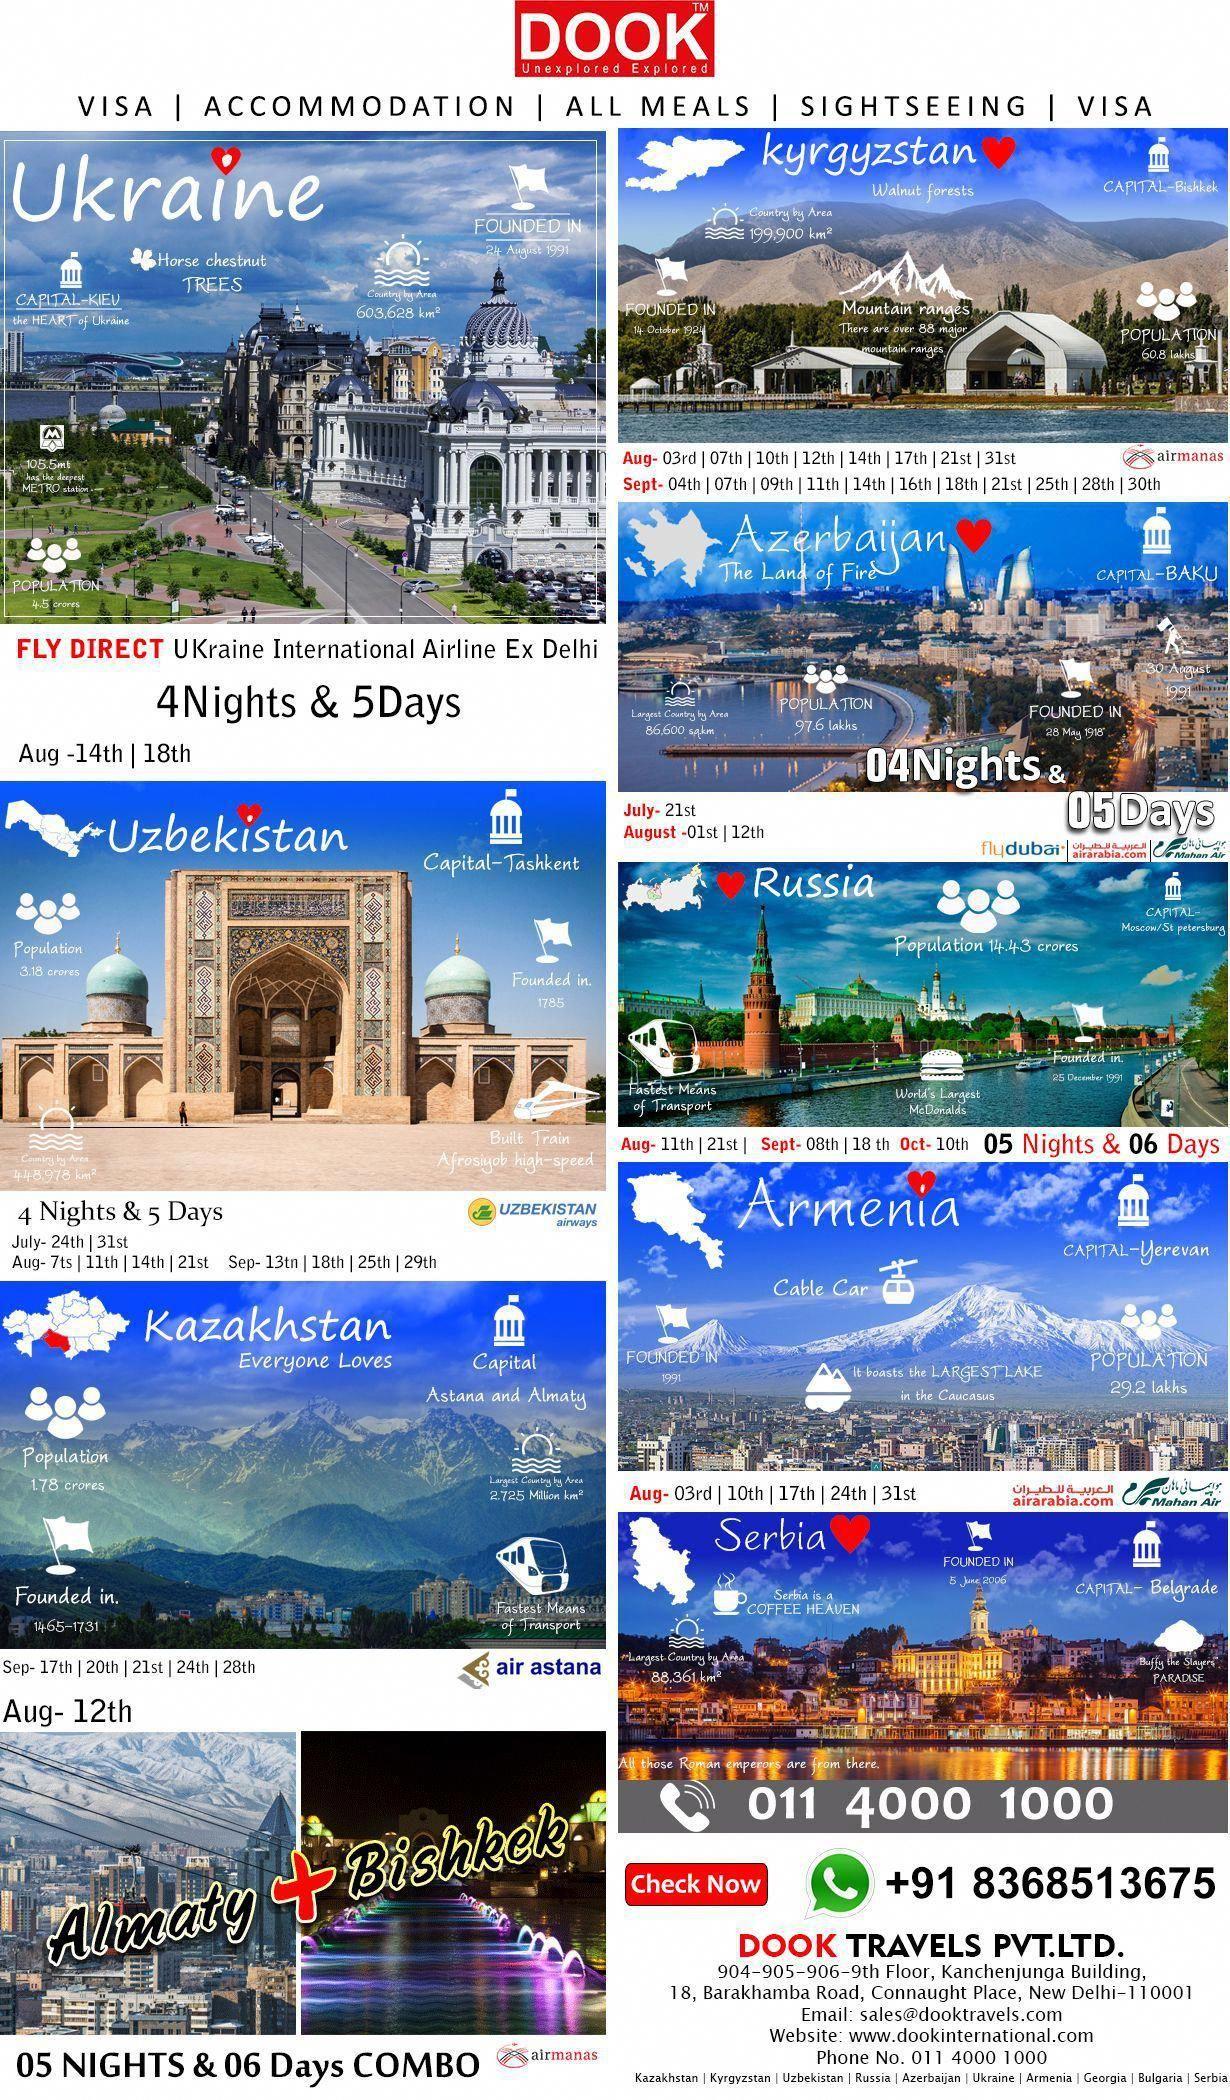 Dook International Is Offering 4 Nights 5 Days Package For Ukraine Uzbekistan Kyrgyzstan Azerbaijan Russia Best Vacation Destinations Hotel Booking Hotel